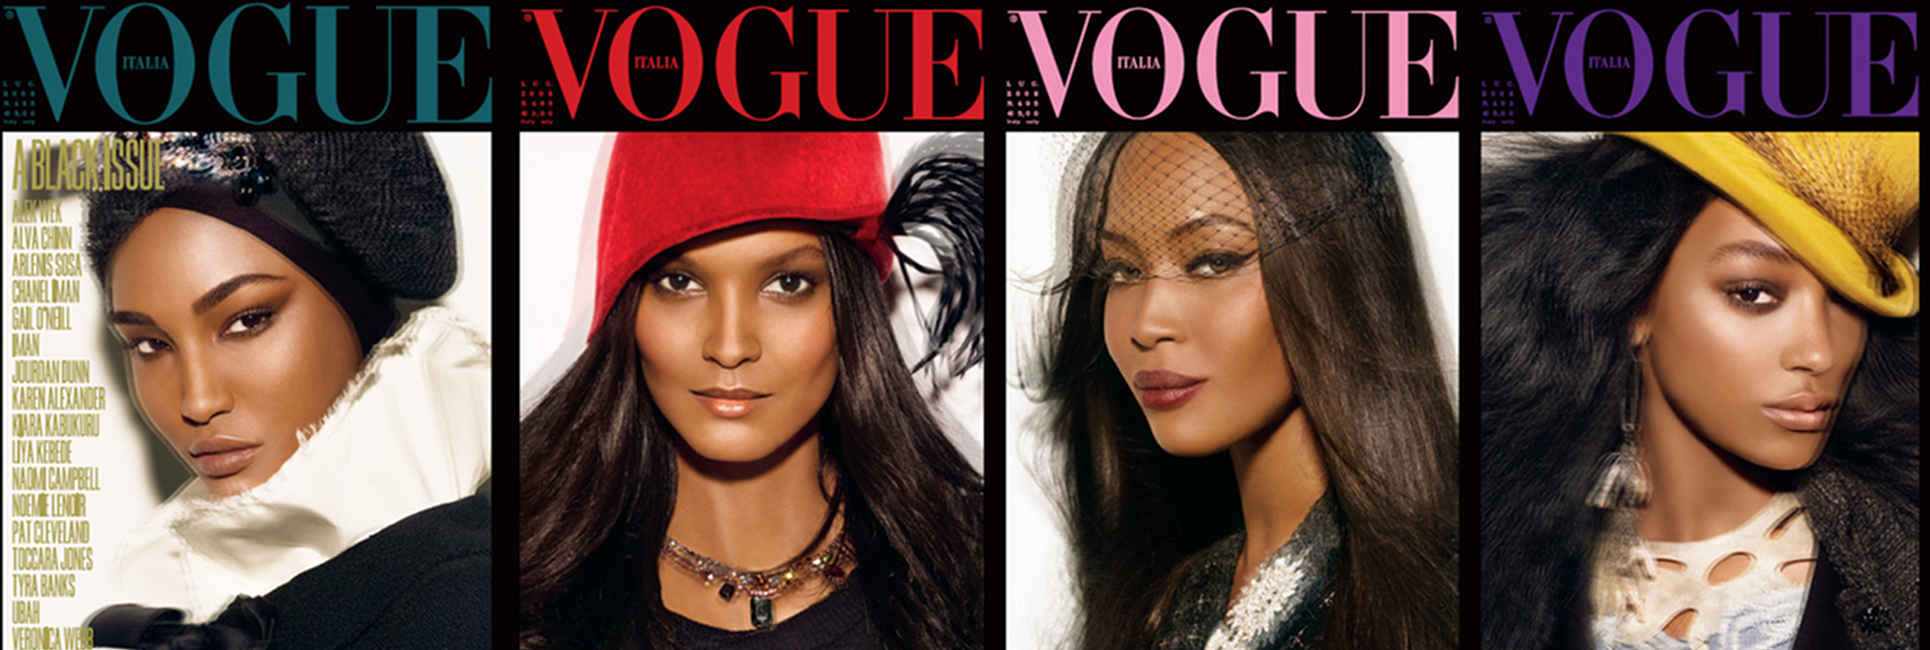 Photo credit: Steven Meisel for Vogue Italia, July 2008